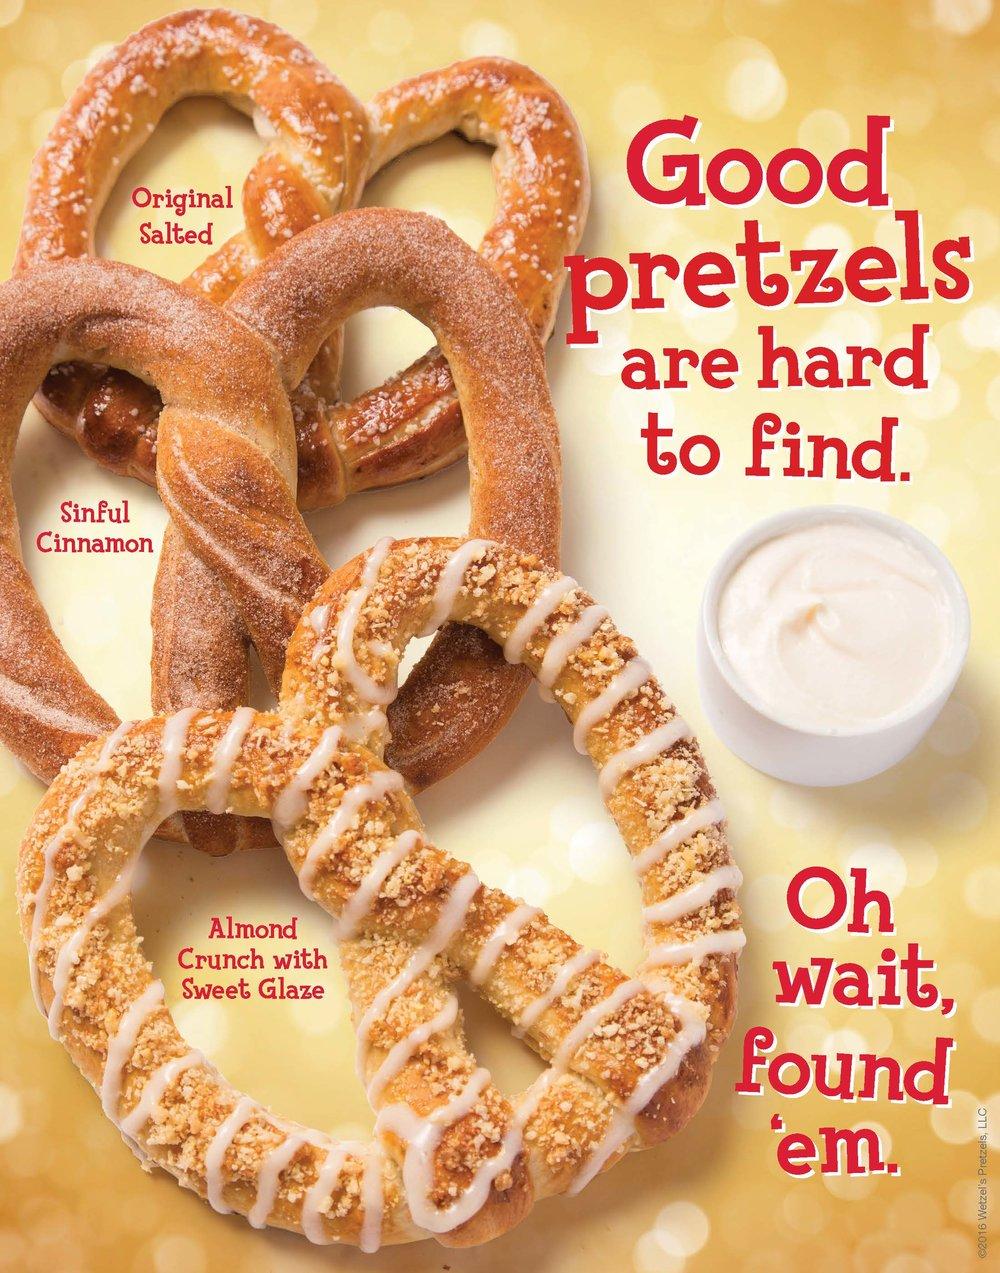 Almond Crunch Poster 3.jpg